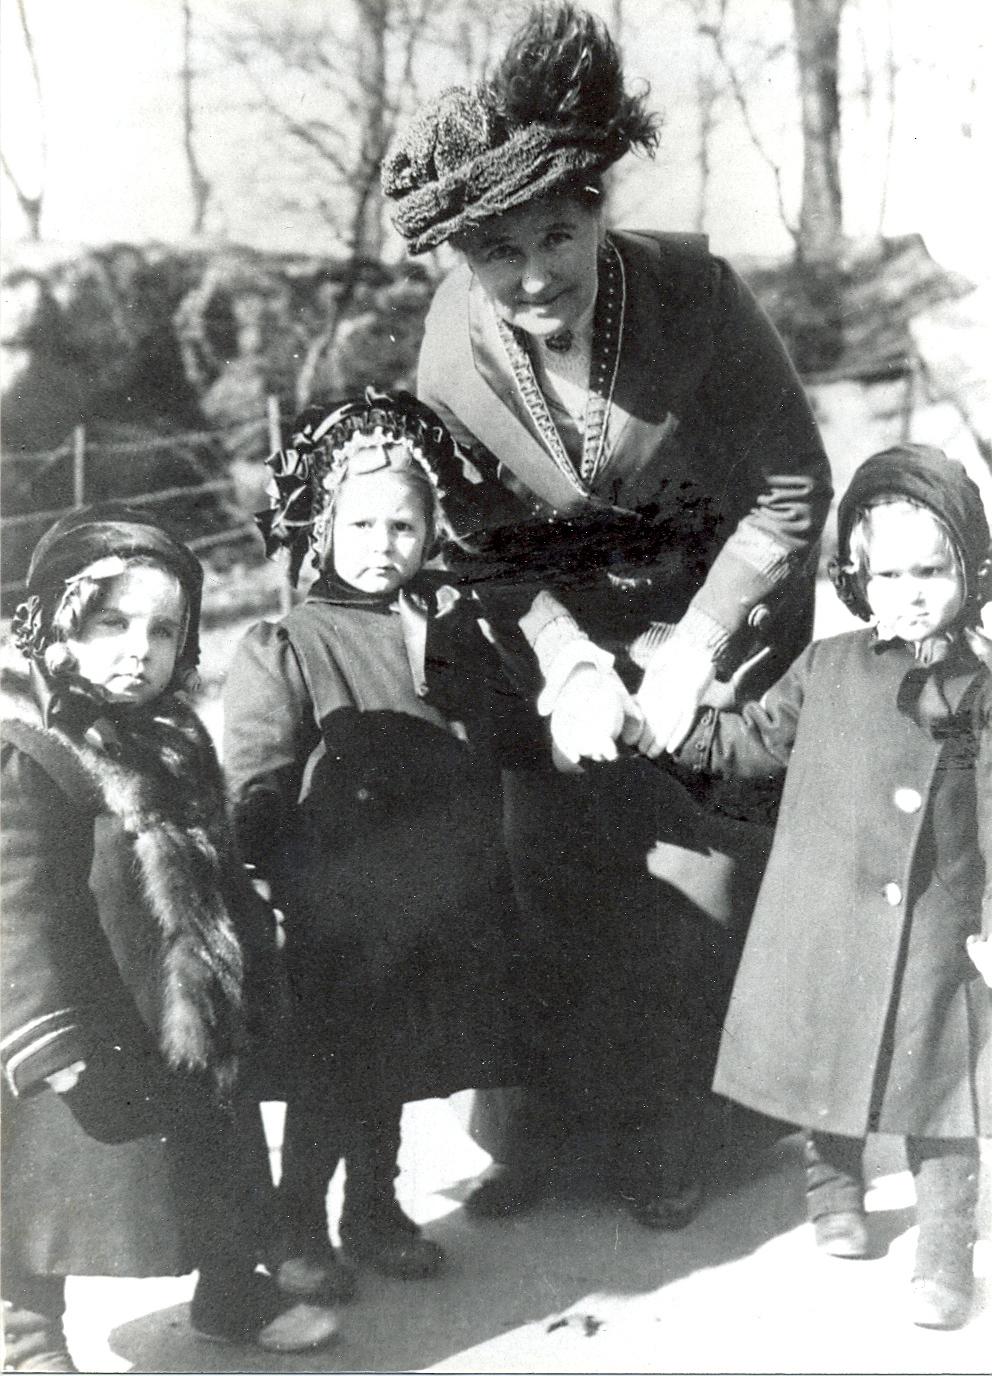 Clara-Spence-Central-Park-February-1911.jpg